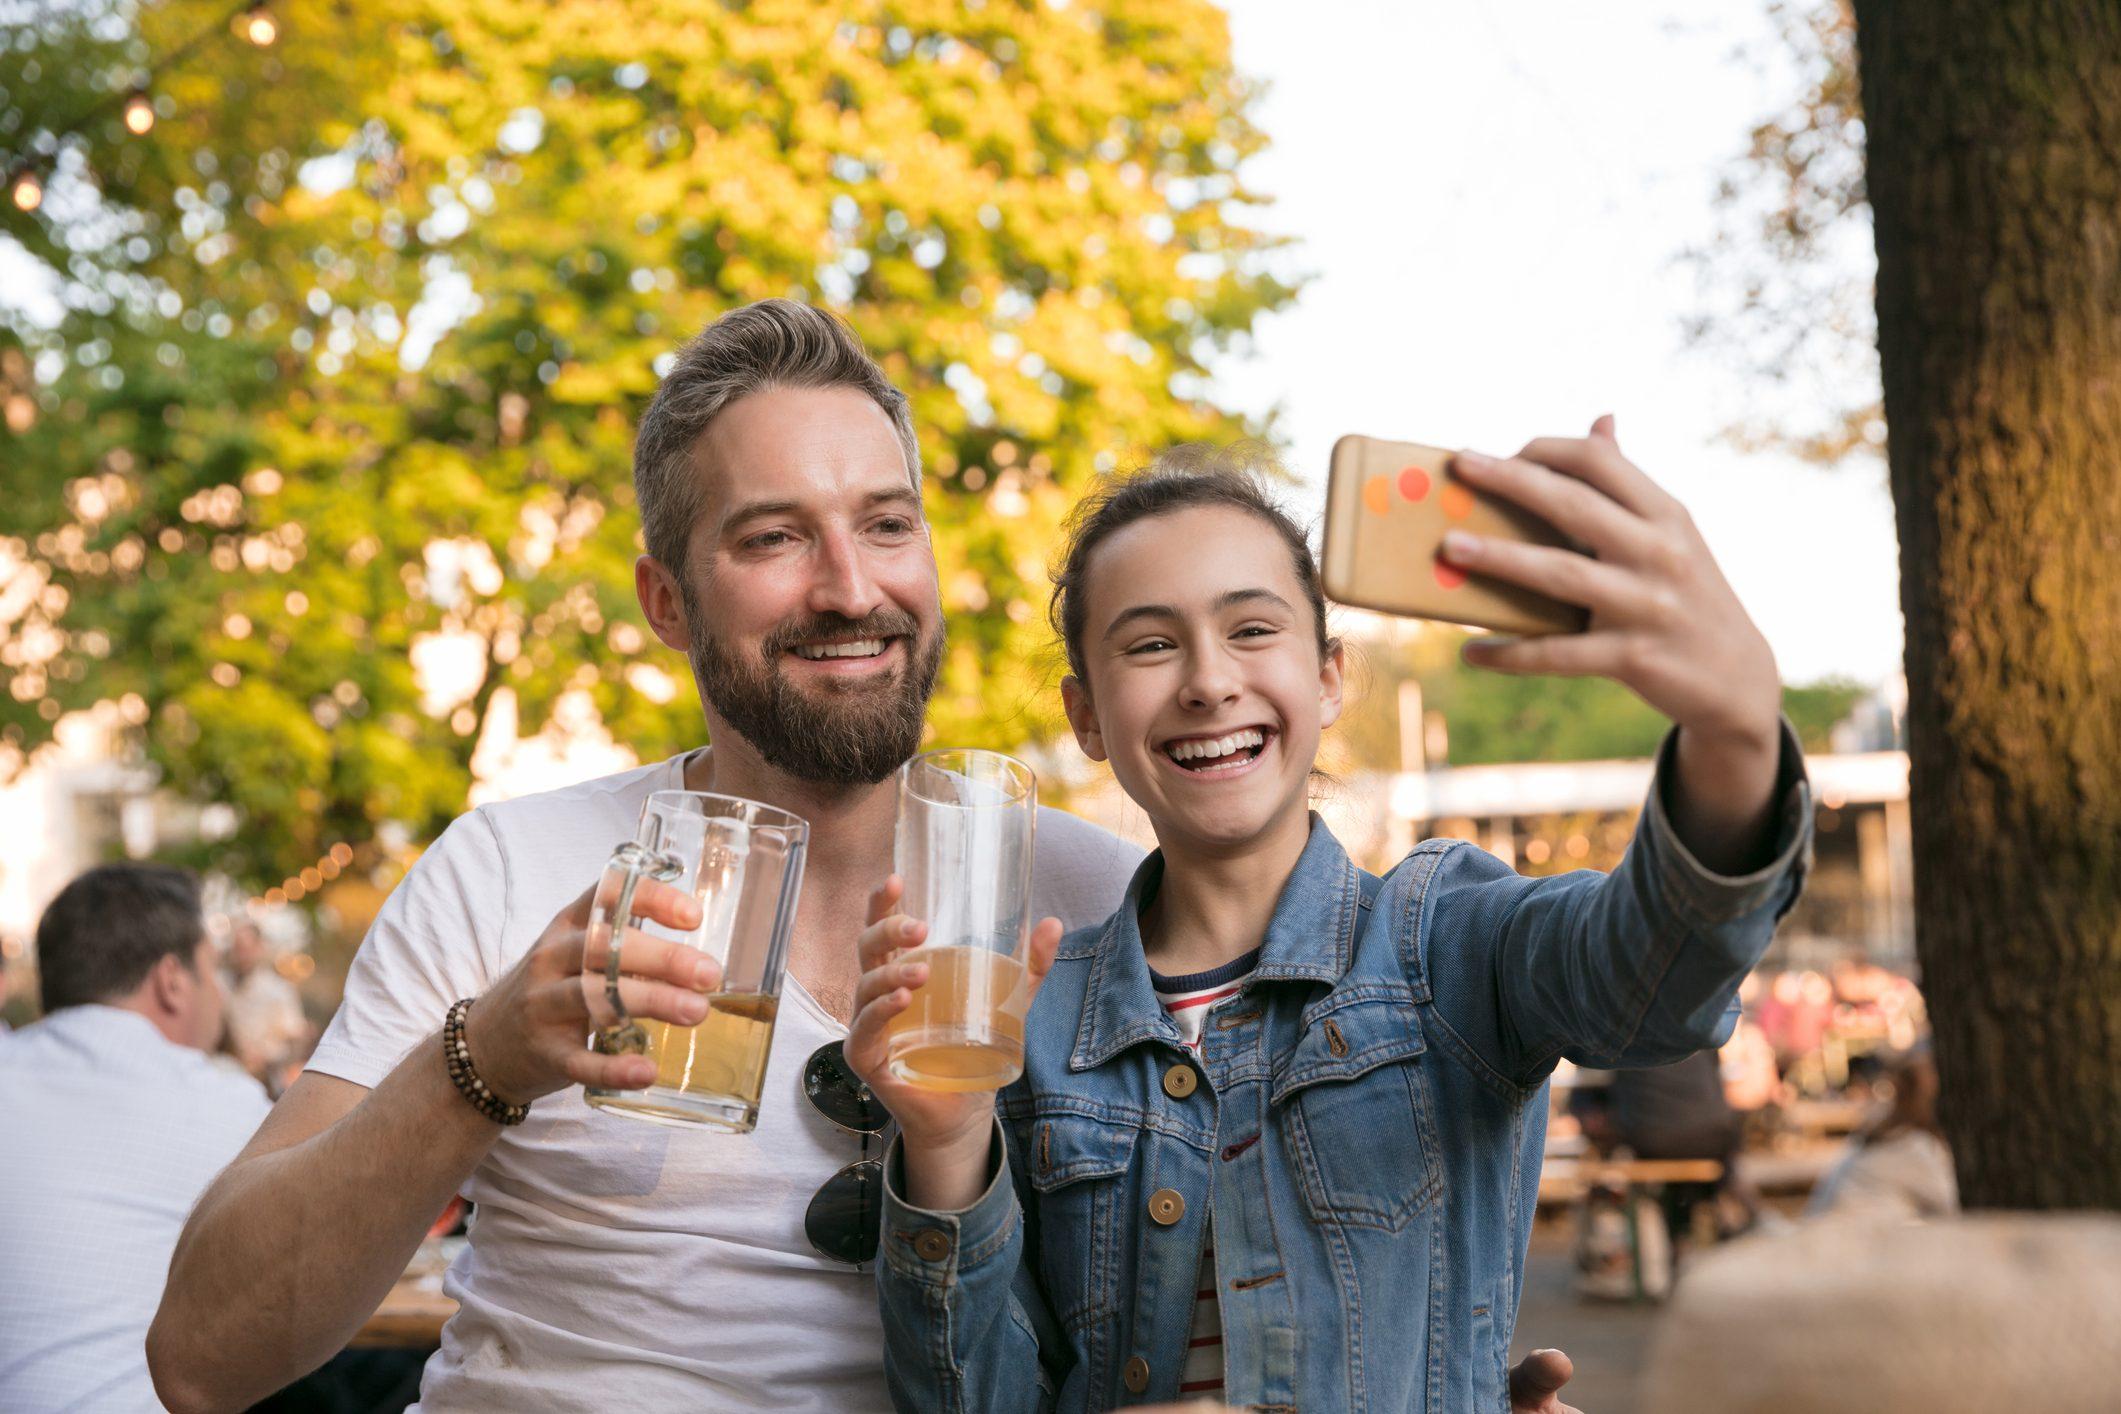 Happy daughter taking selfie while having drink at beer garden